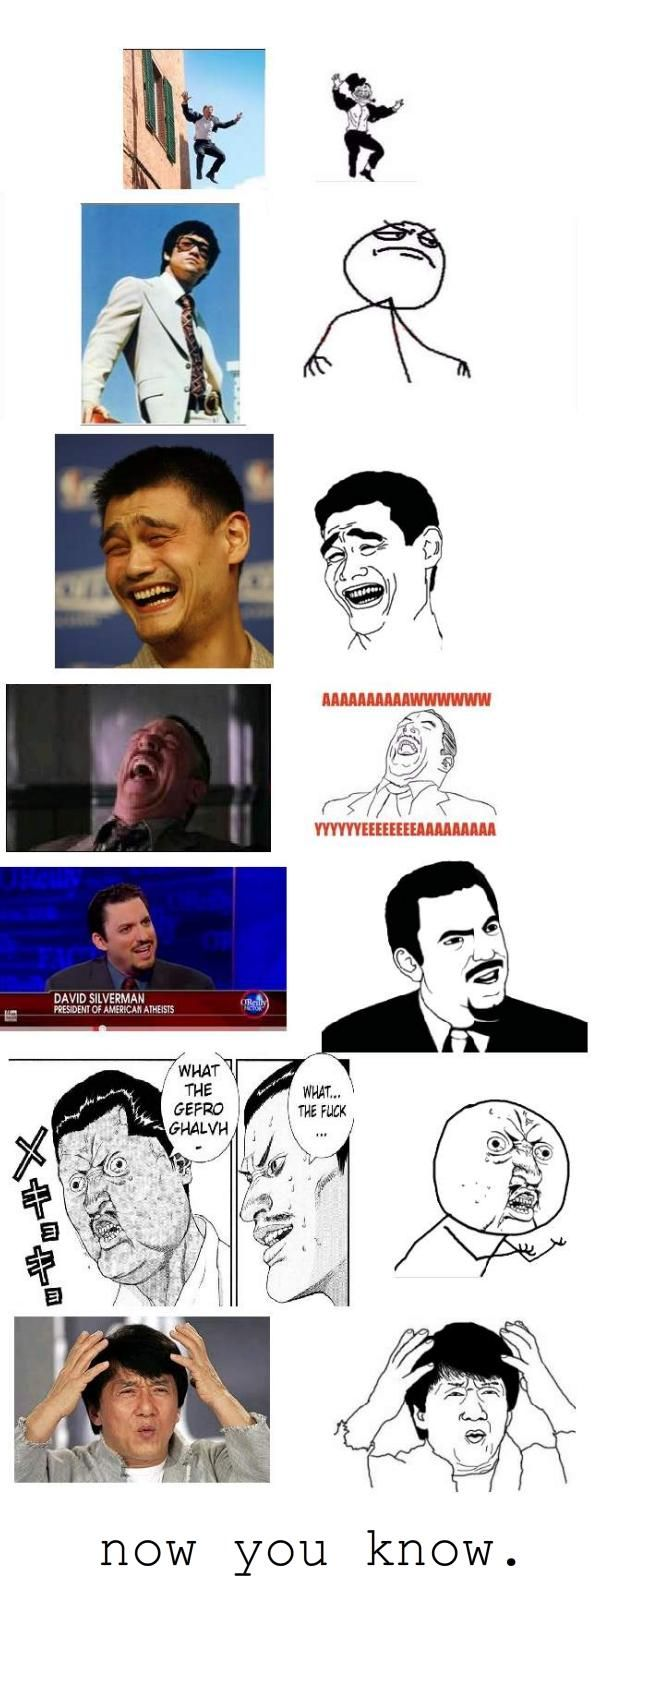 heh heh. /troll'd